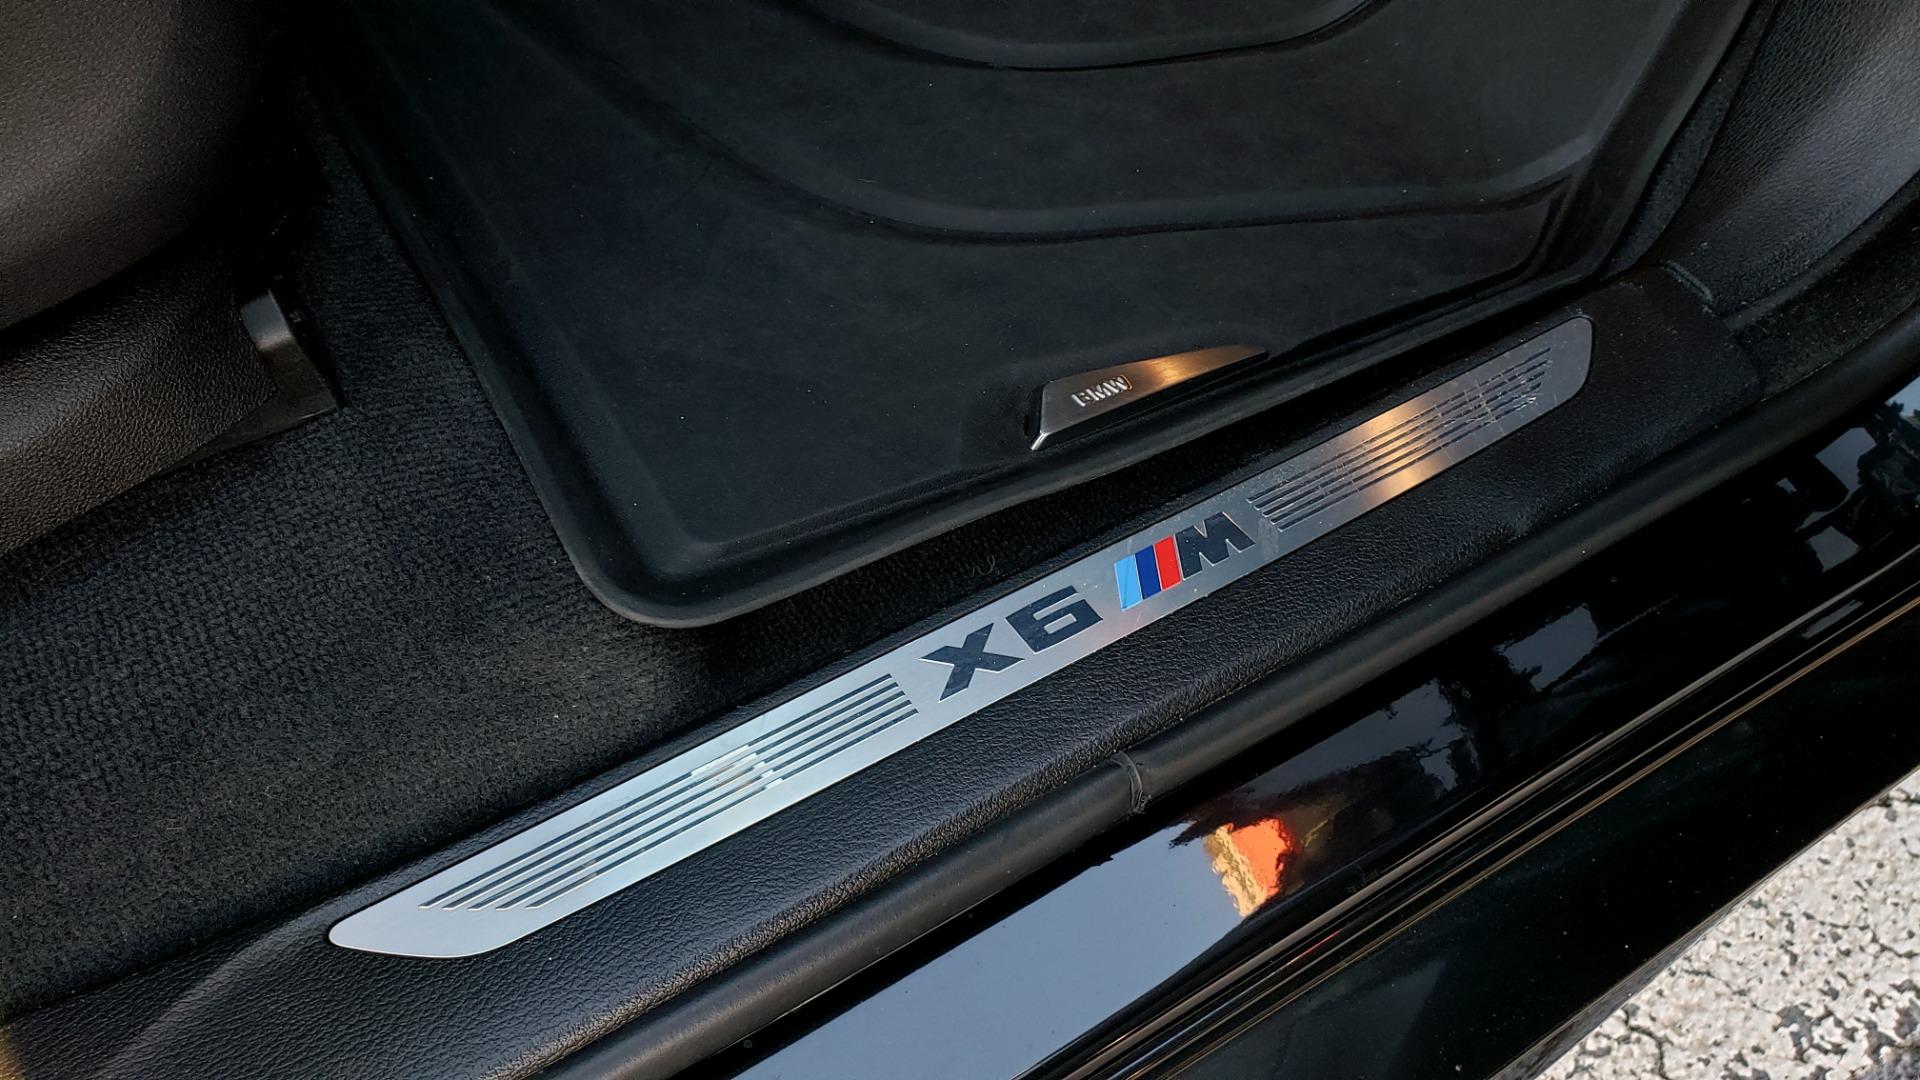 Used 2016 BMW X6 M EXEC PKG / DRVR ASST / NAV / SUNROOF / BLIND SPOT / REARVIEW for sale Sold at Formula Imports in Charlotte NC 28227 70